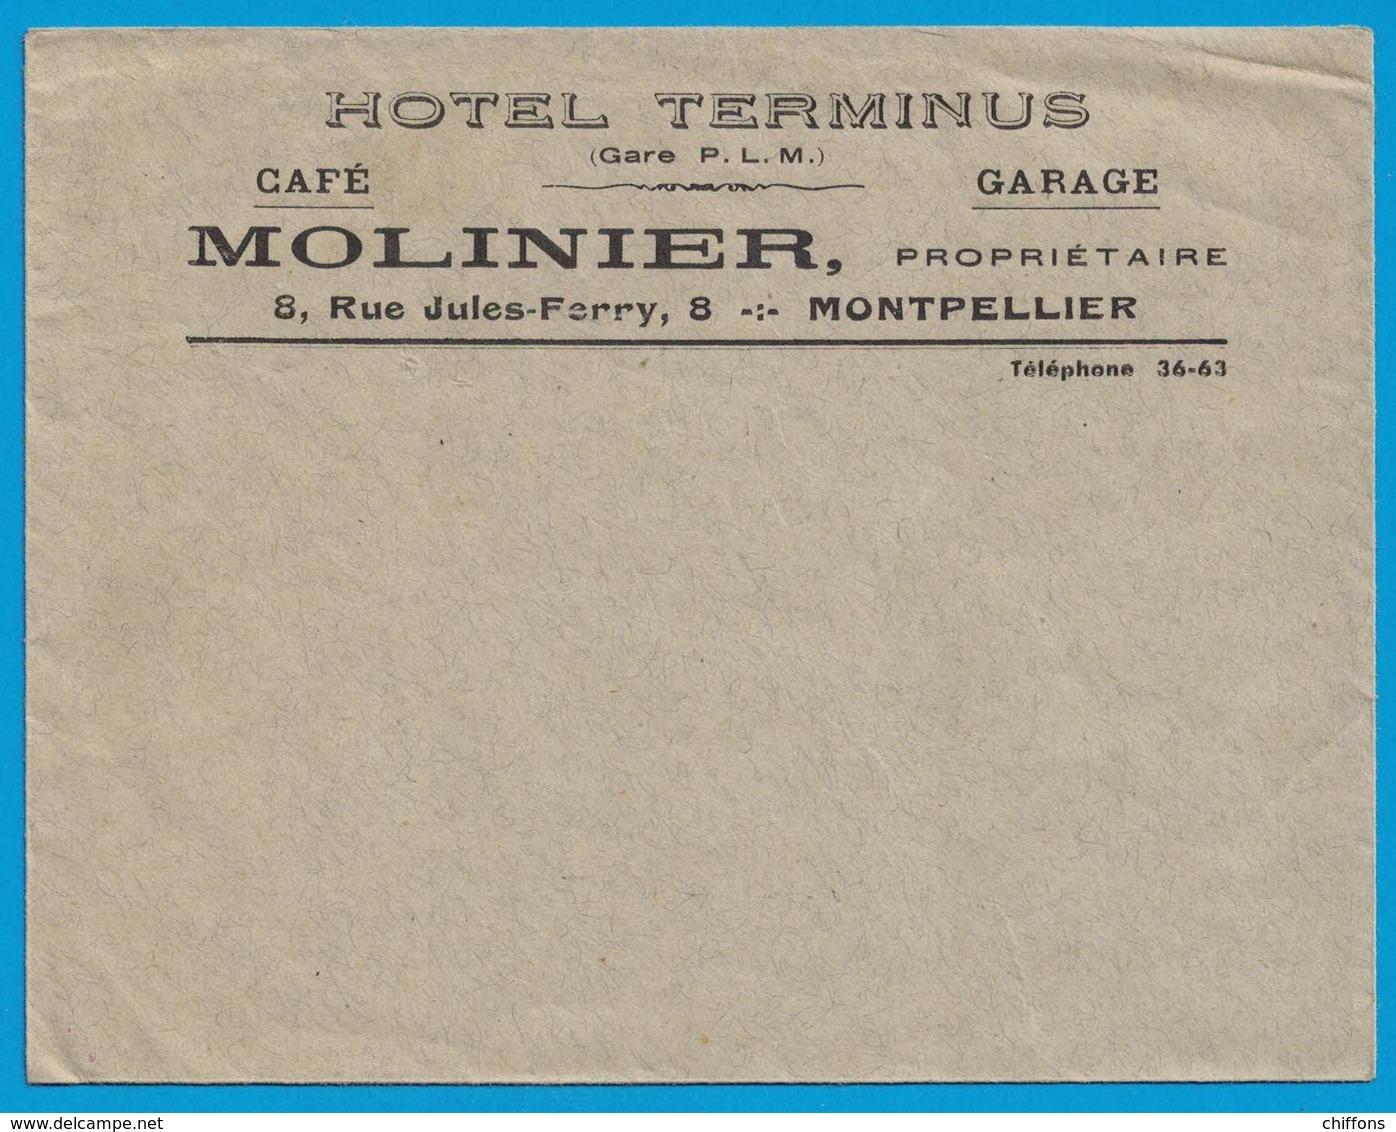 ENVELOPPE HOTEL TERMINUS GARE P.L.M. CAFE GARAGE MOLINIER PROPRIETAIRE 8 RUE JULES-FERRY MONTPELLIER - Publicités